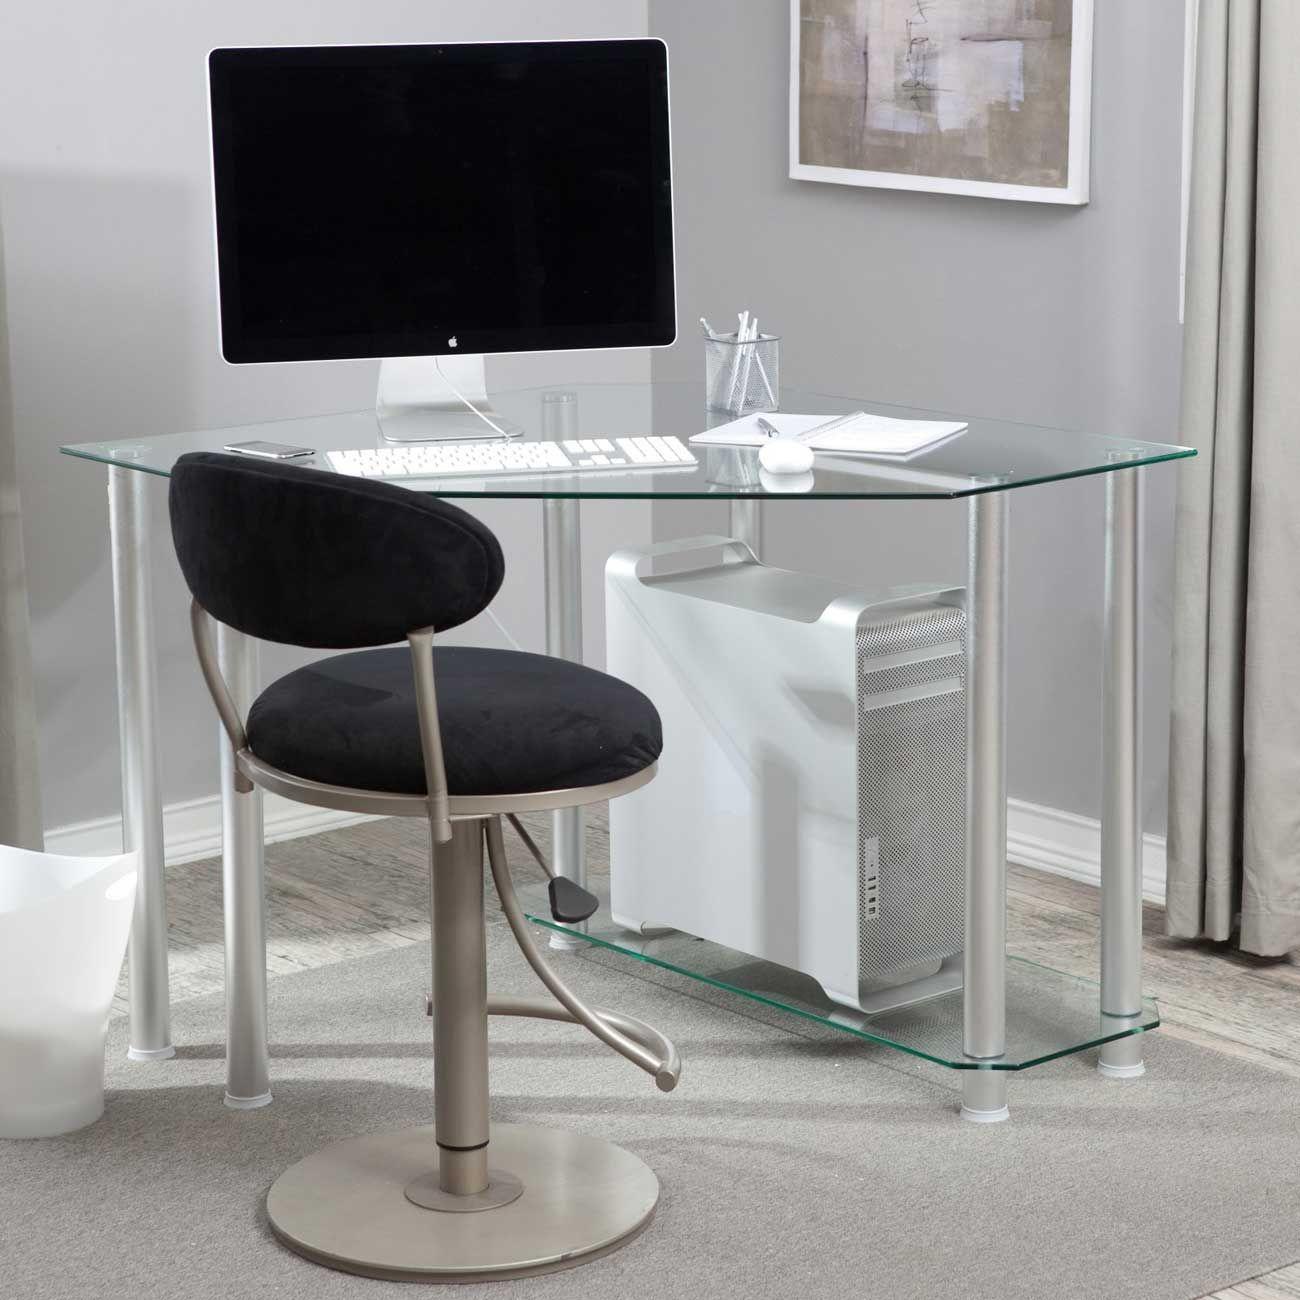 Small Glass Corner Computer Desk Best Home Office Desks Check More At Http Www Gameintown Com S Glass Corner Desk Desks For Small Spaces Modern Corner Desk